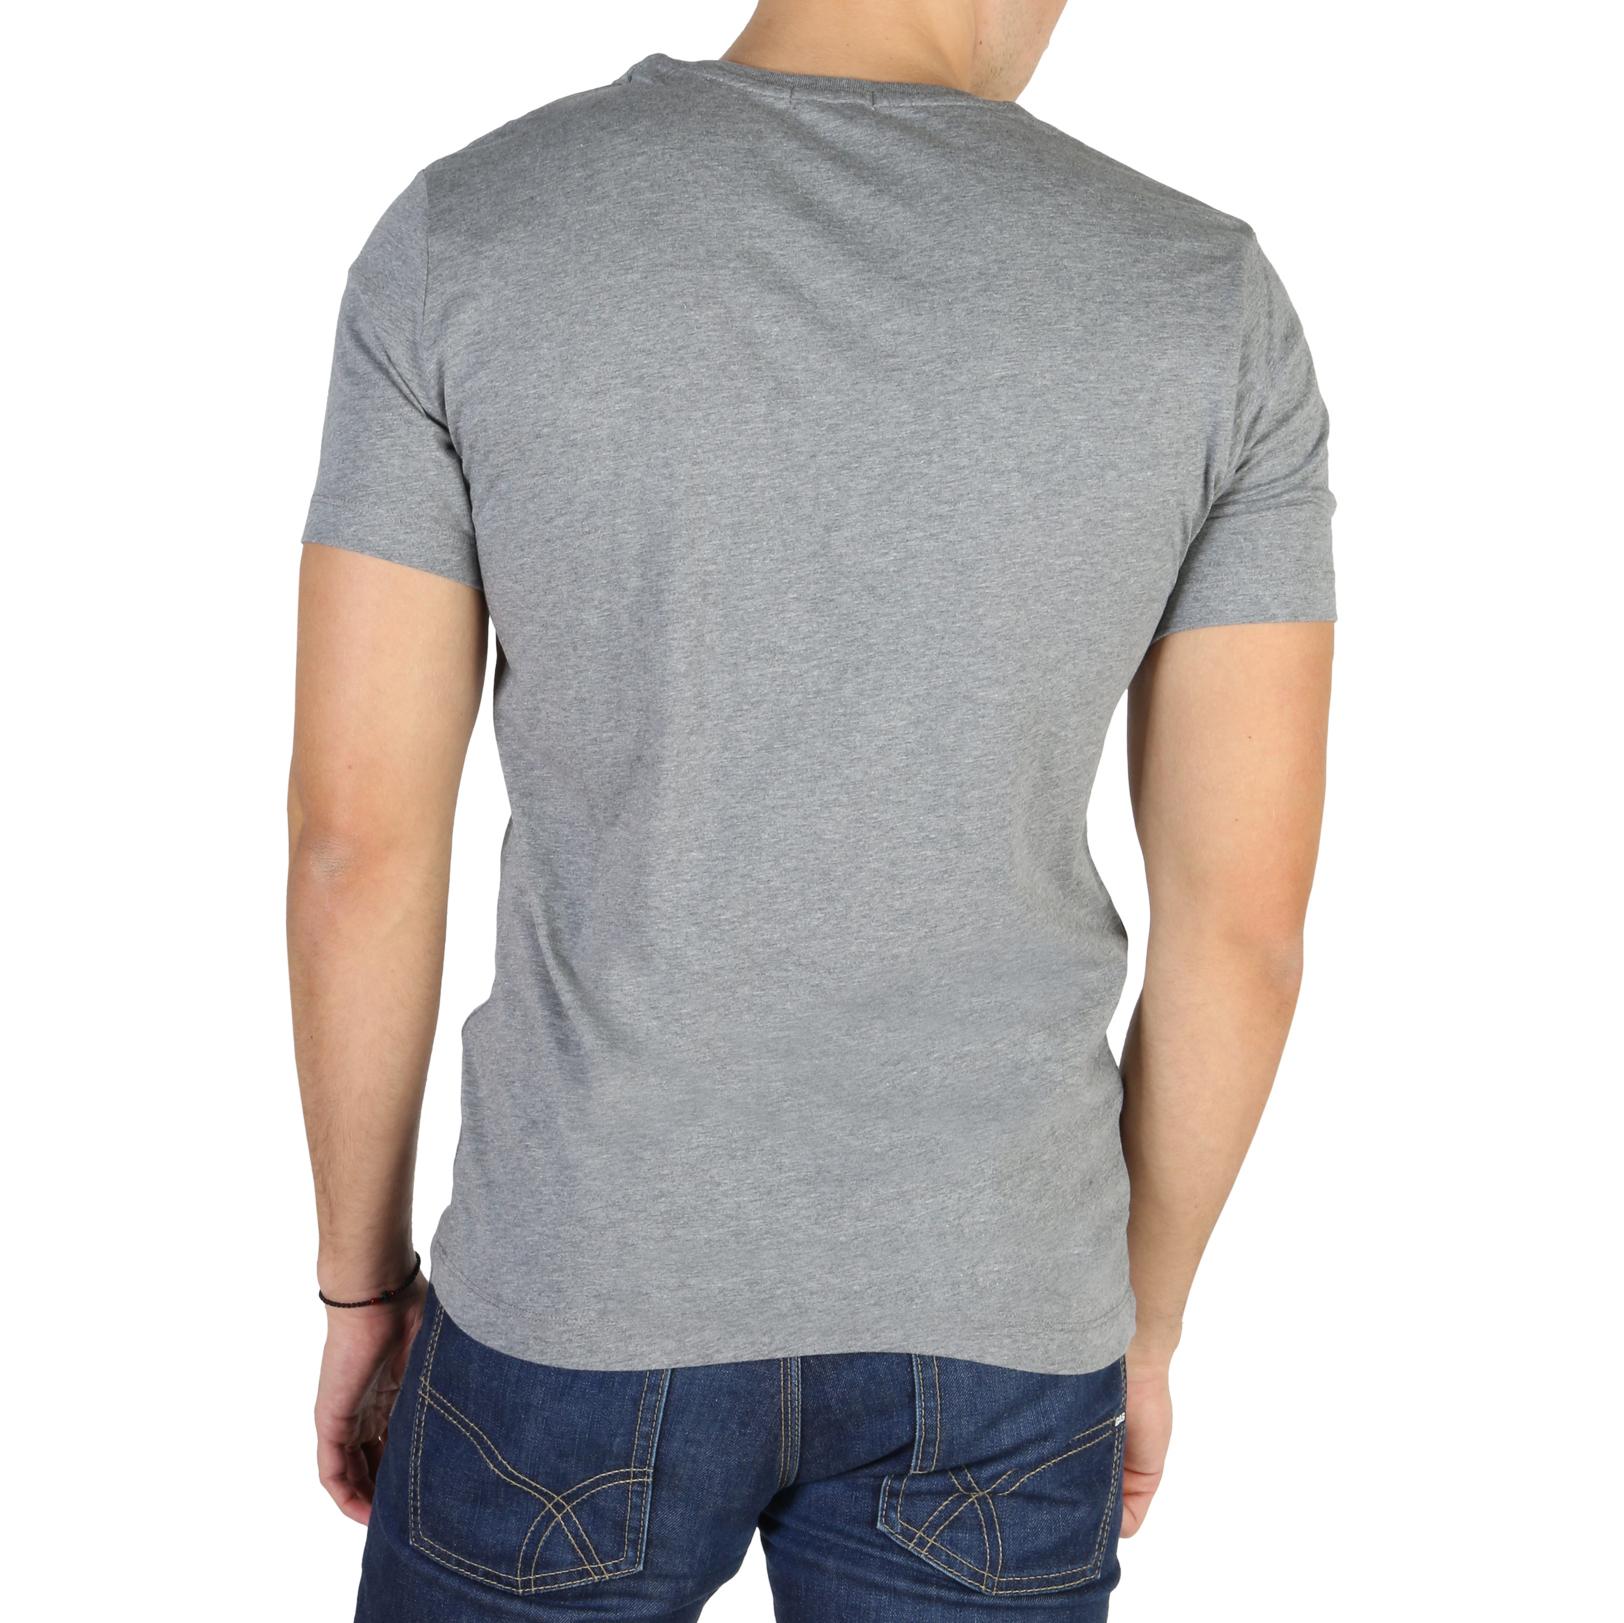 T-SHIRT-Calvin-Klein-J3IJ302251-Uomo-Grigio-104159-CASUAL-VINTAGE miniatura 2